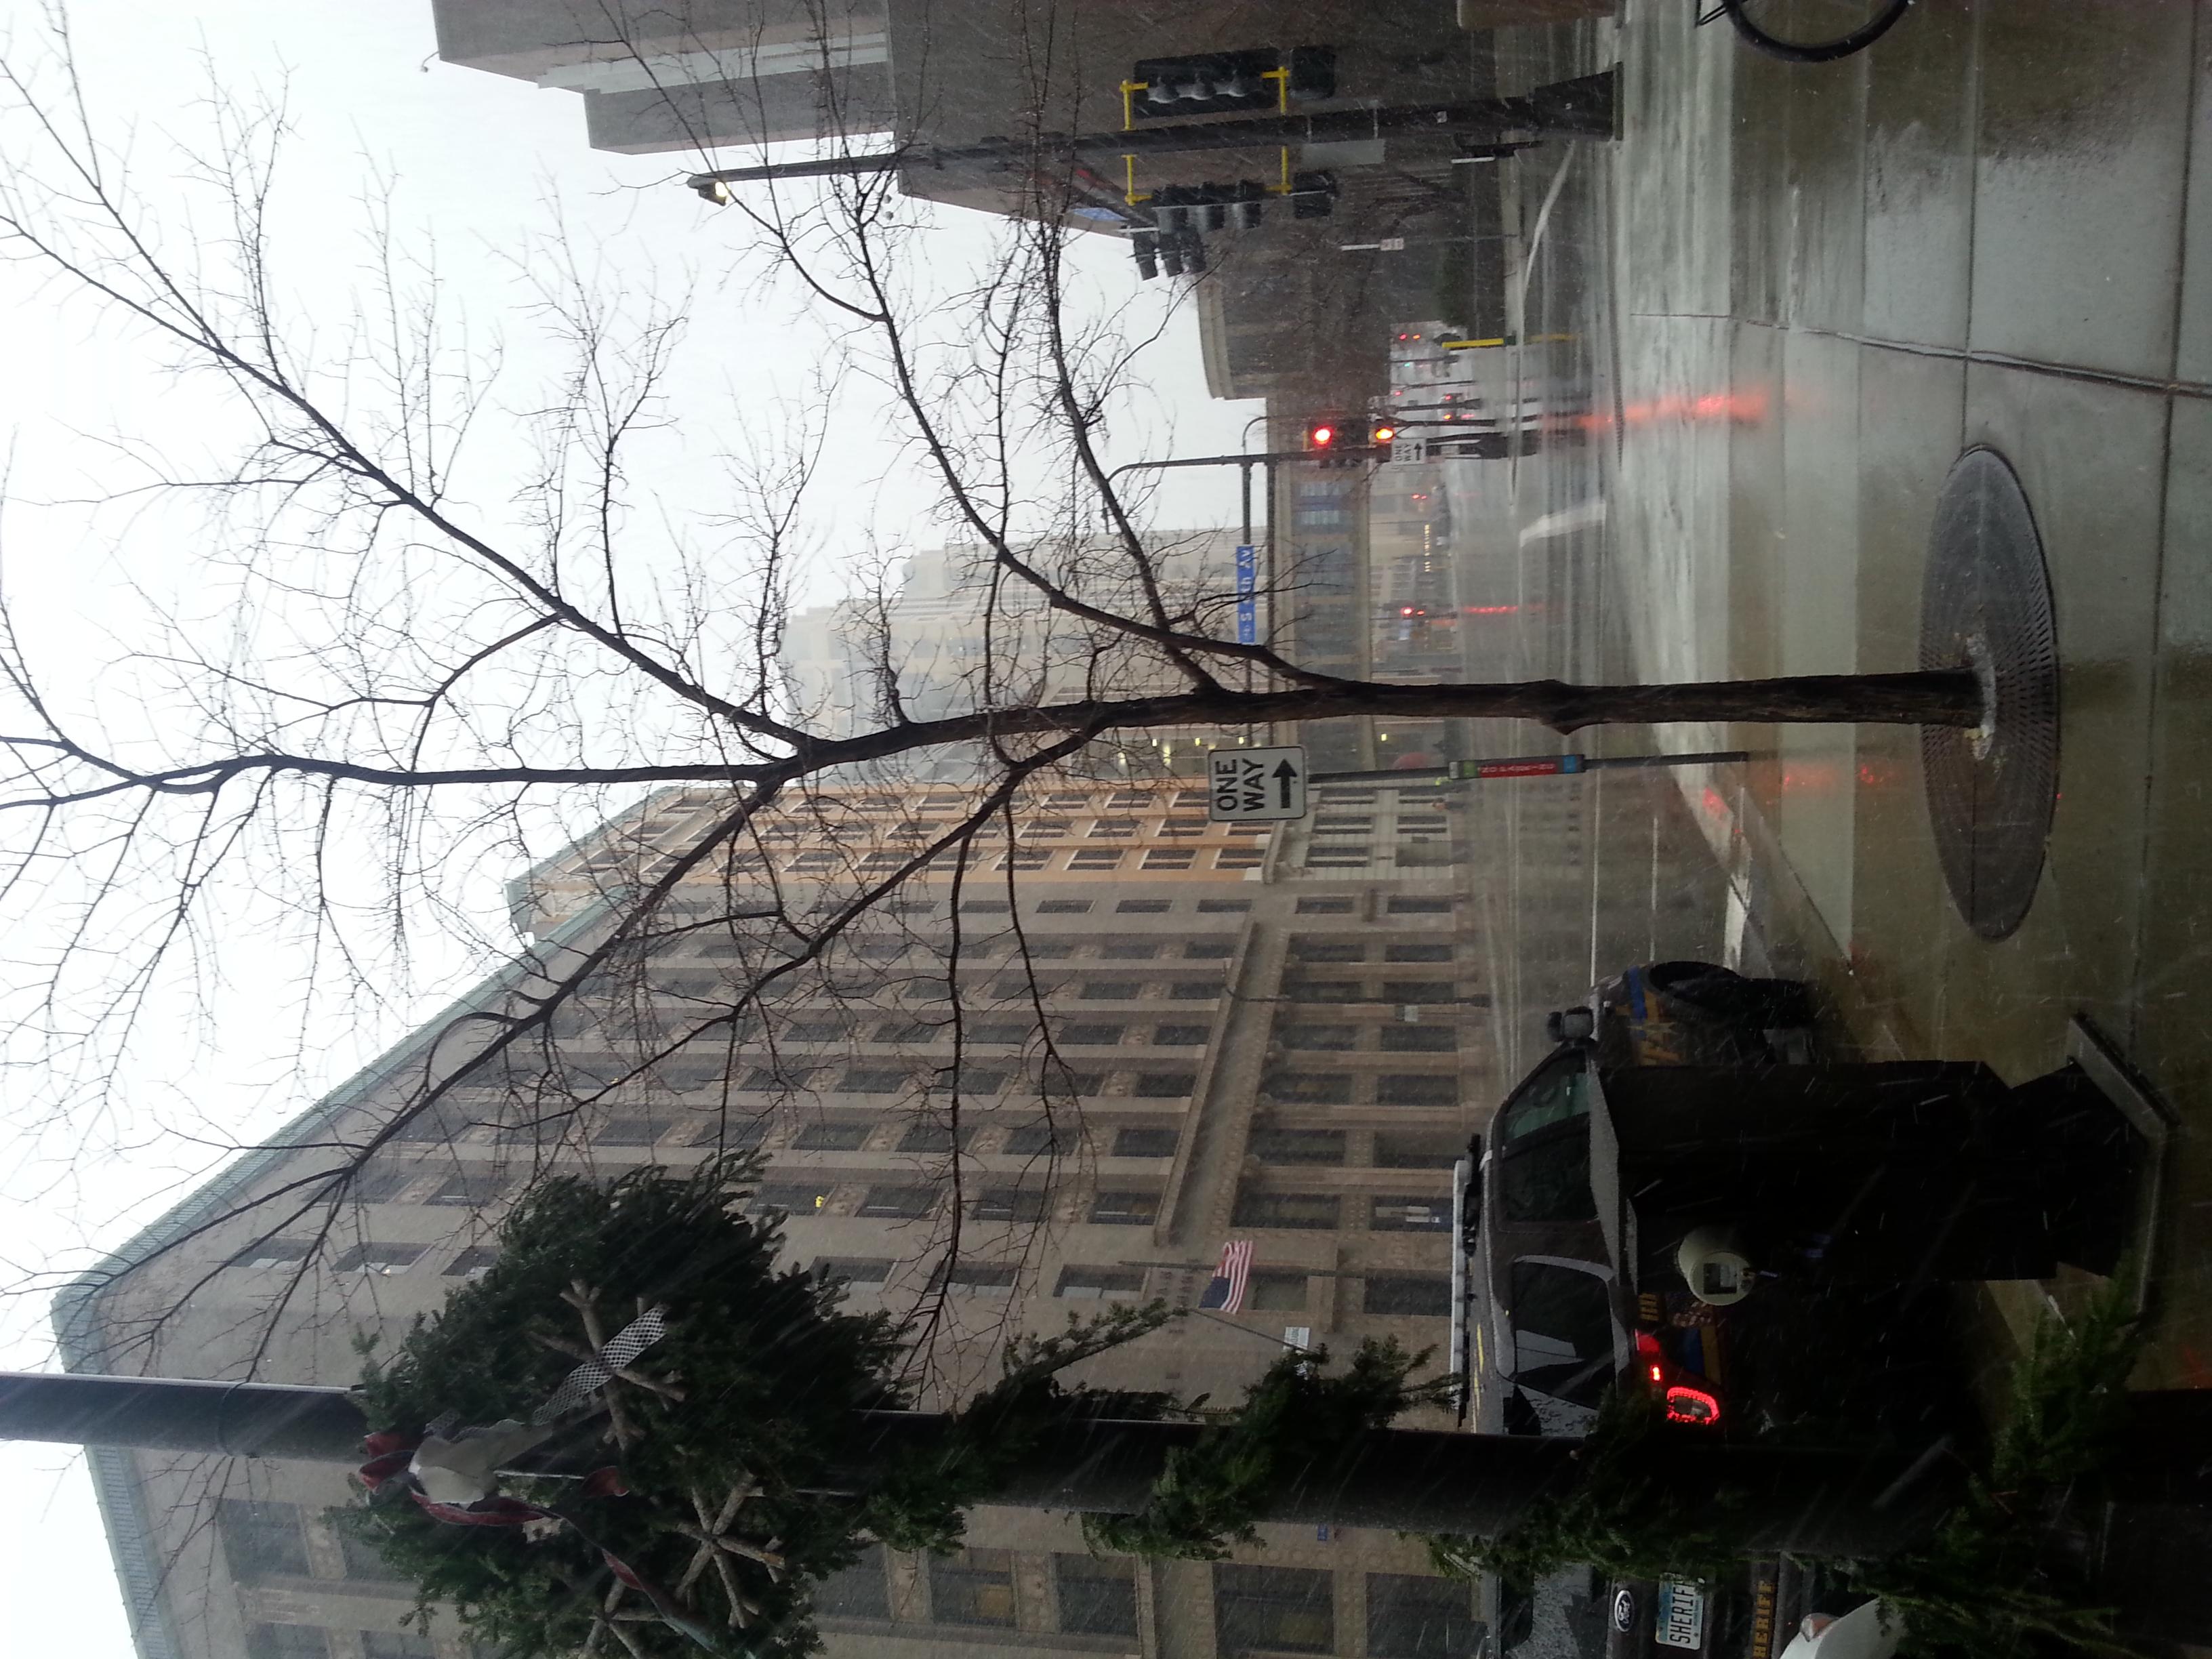 Sleeting snowy mess